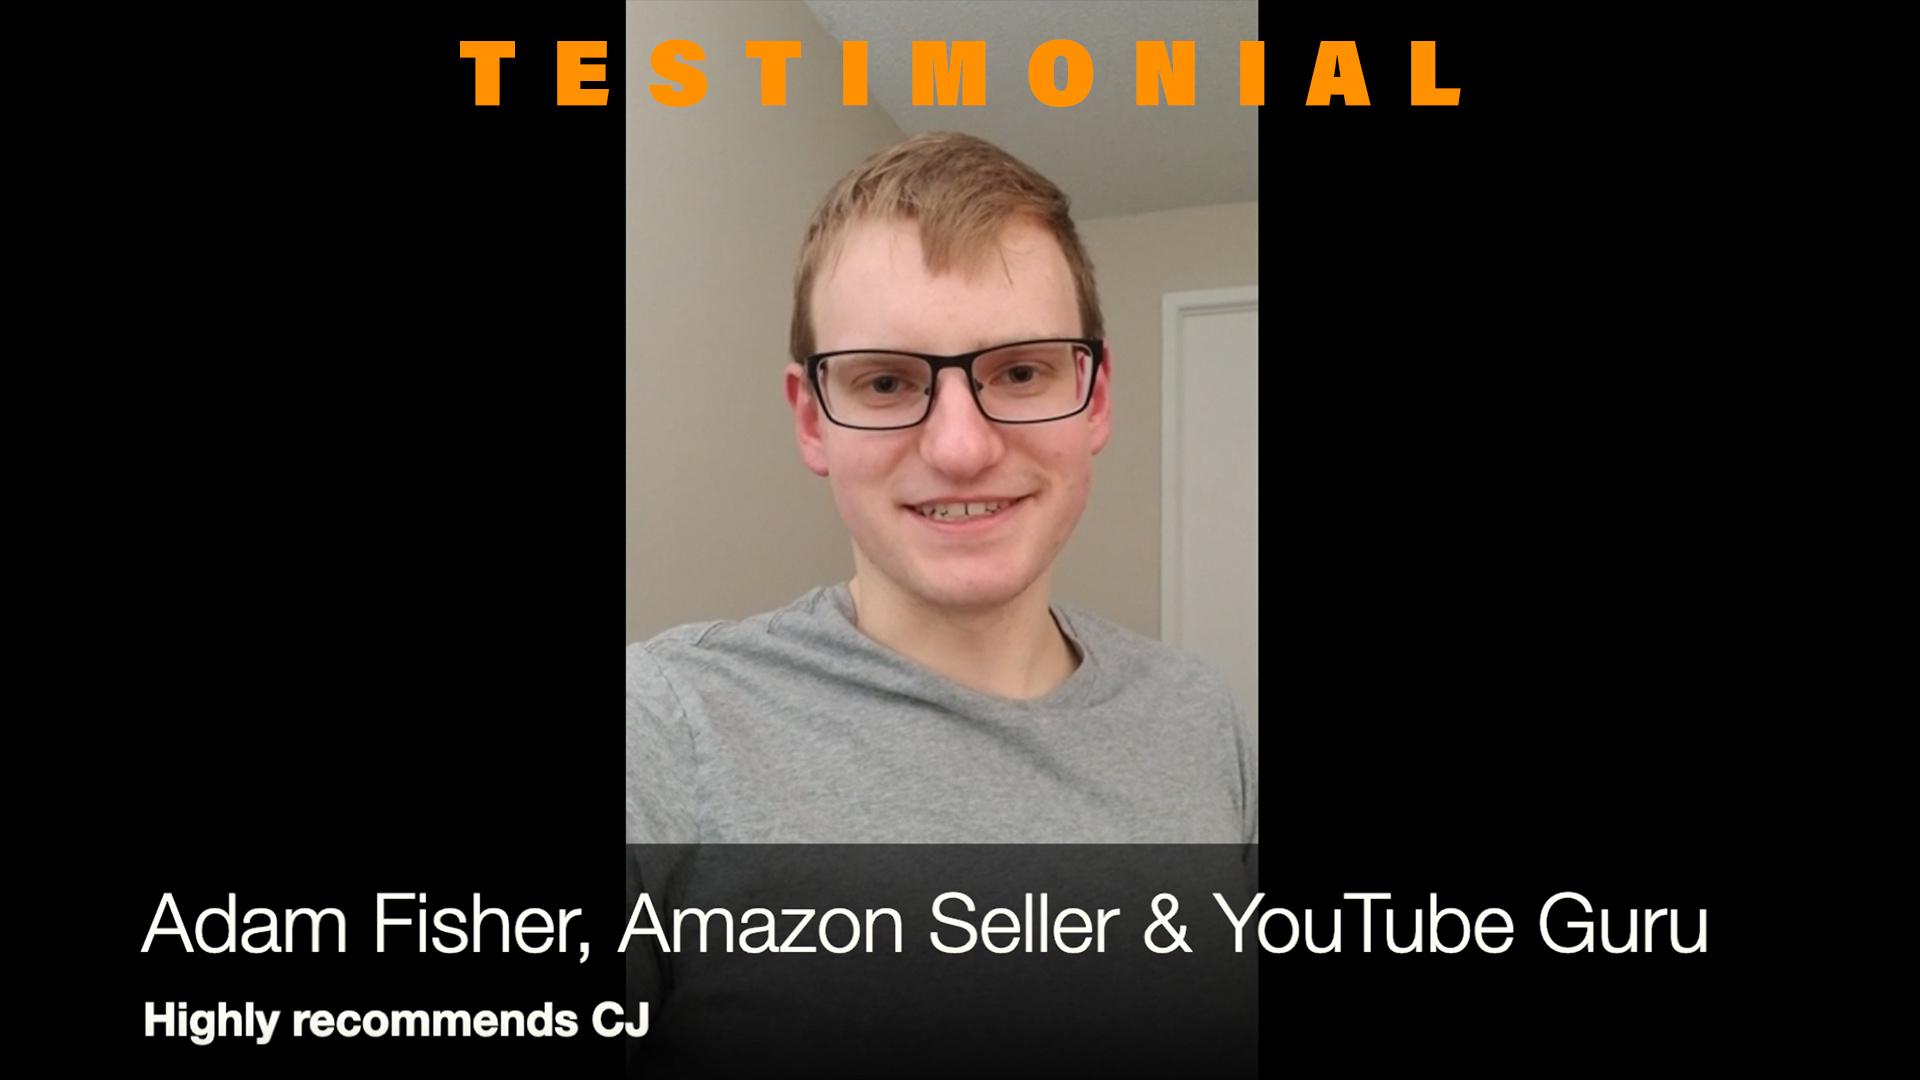 Amazon Seller Testimonial - Easy to Communicate With CJ